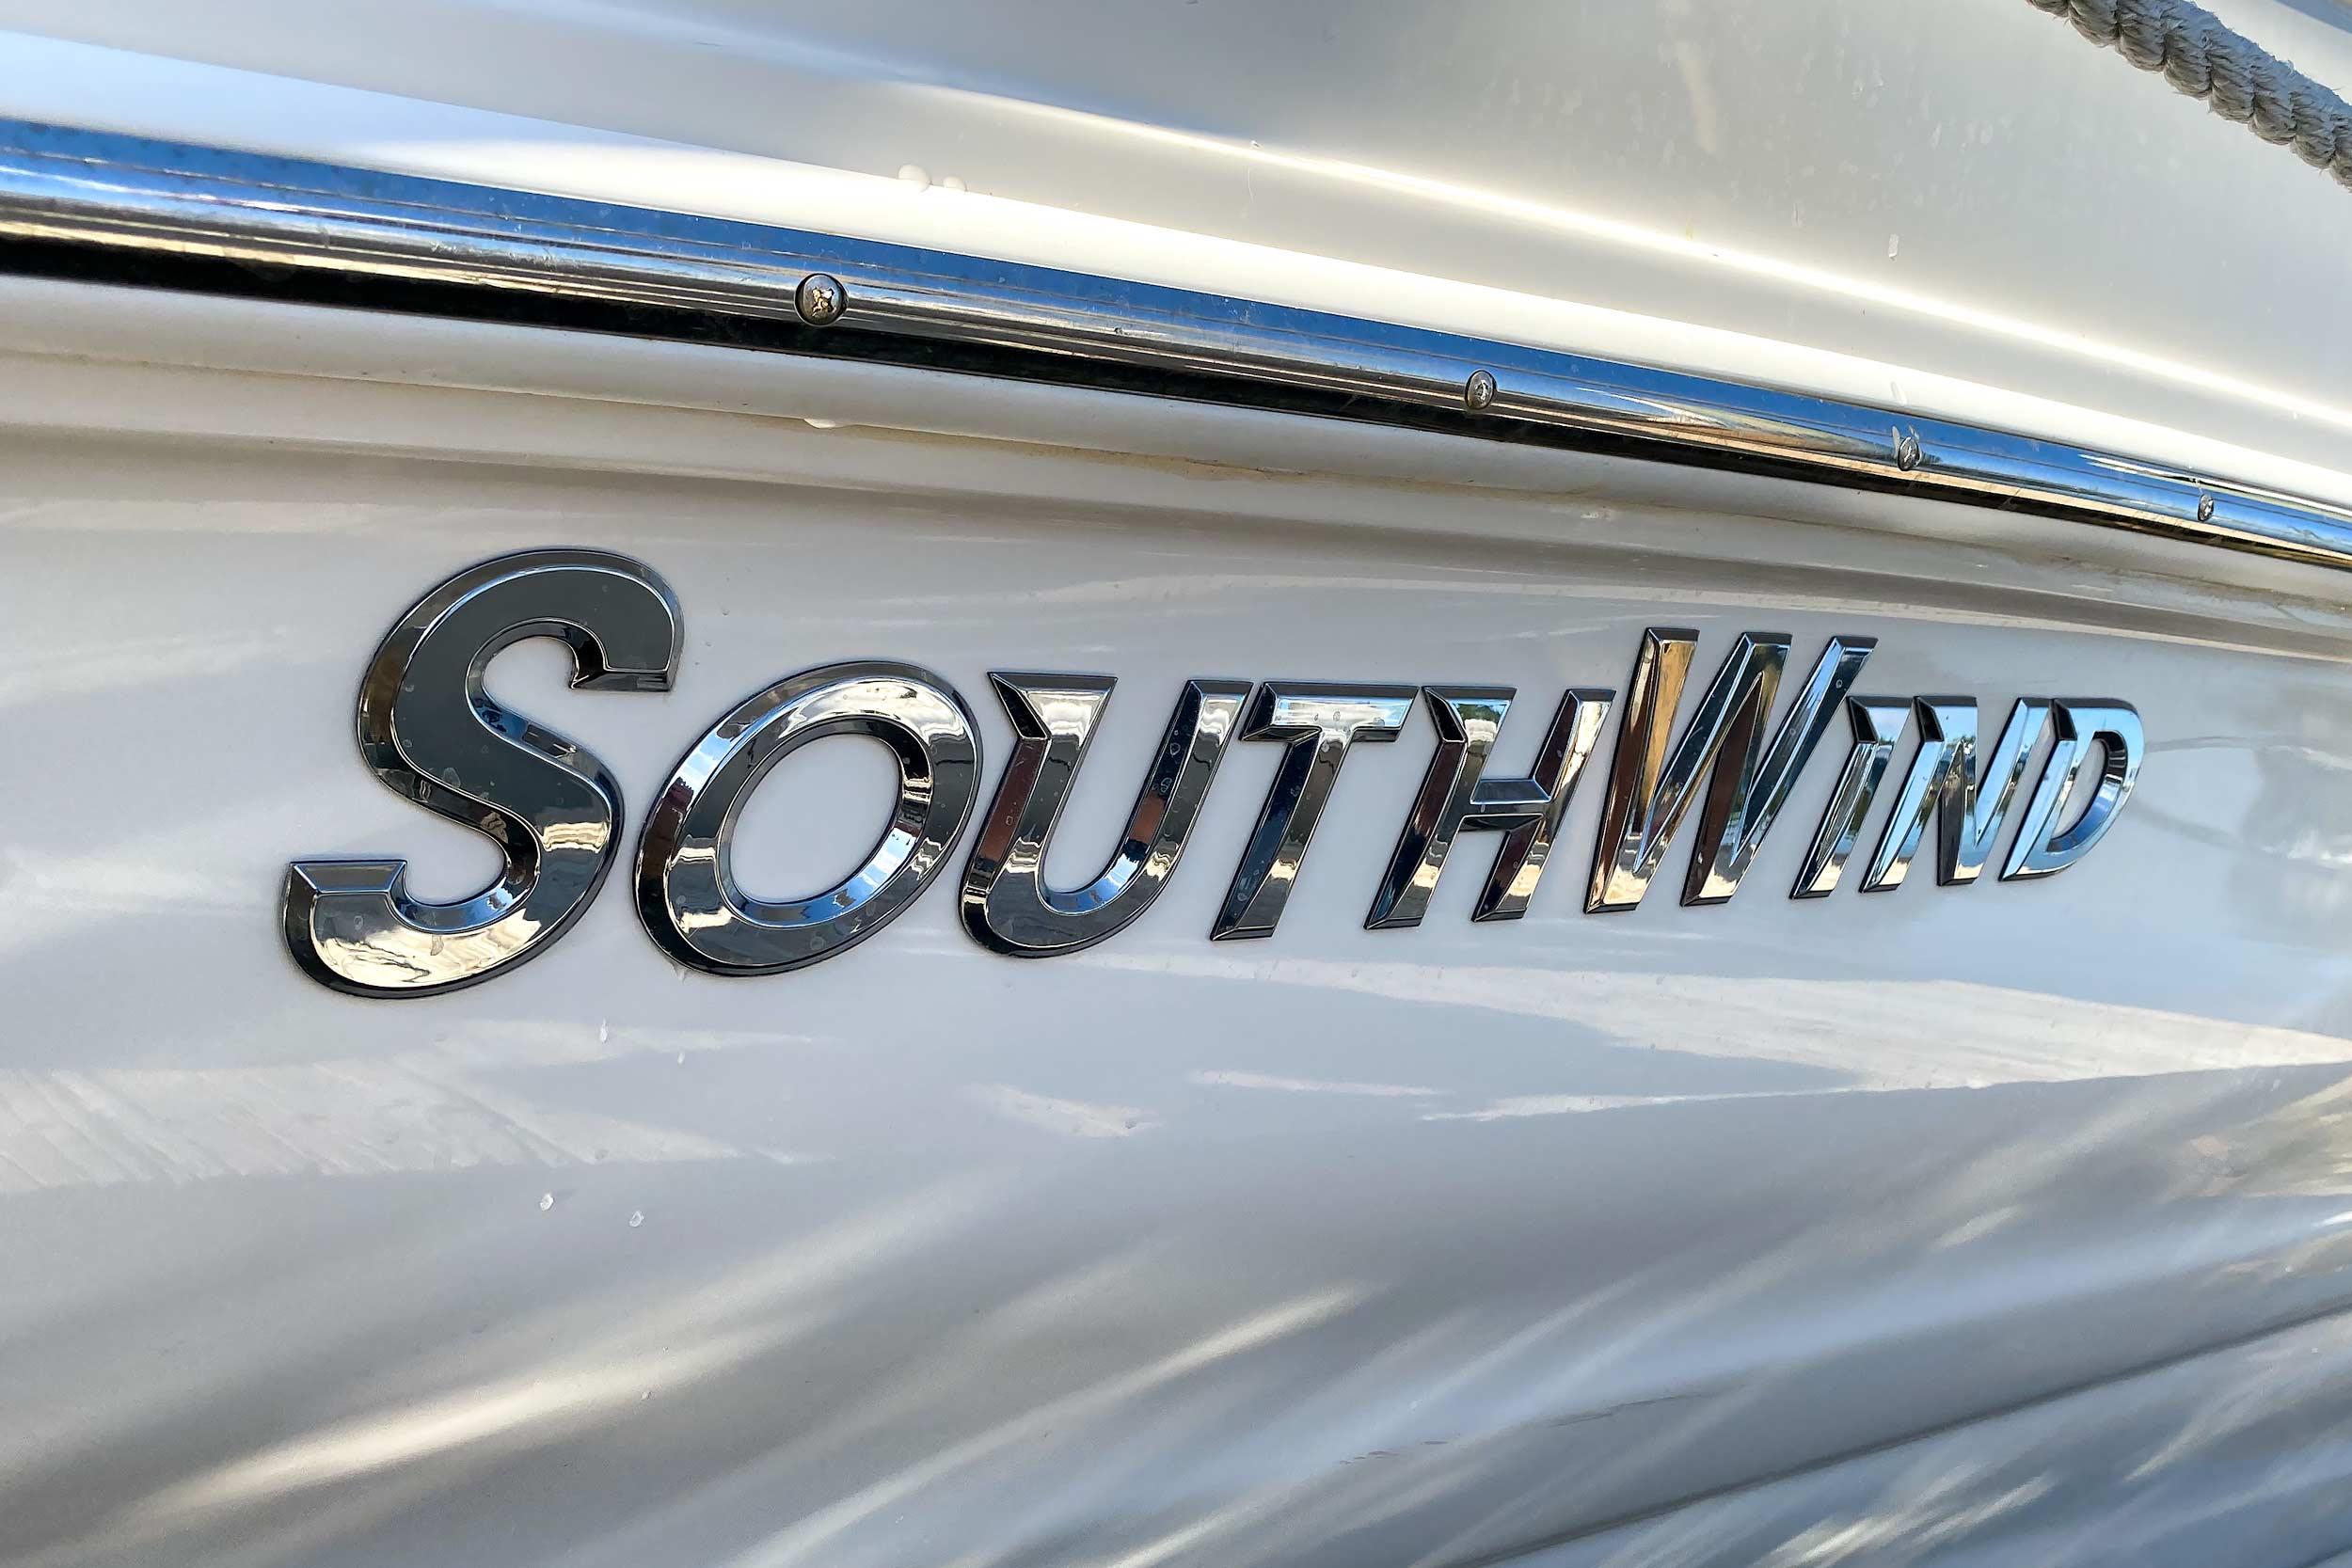 2019 SouthWind 2400 SD